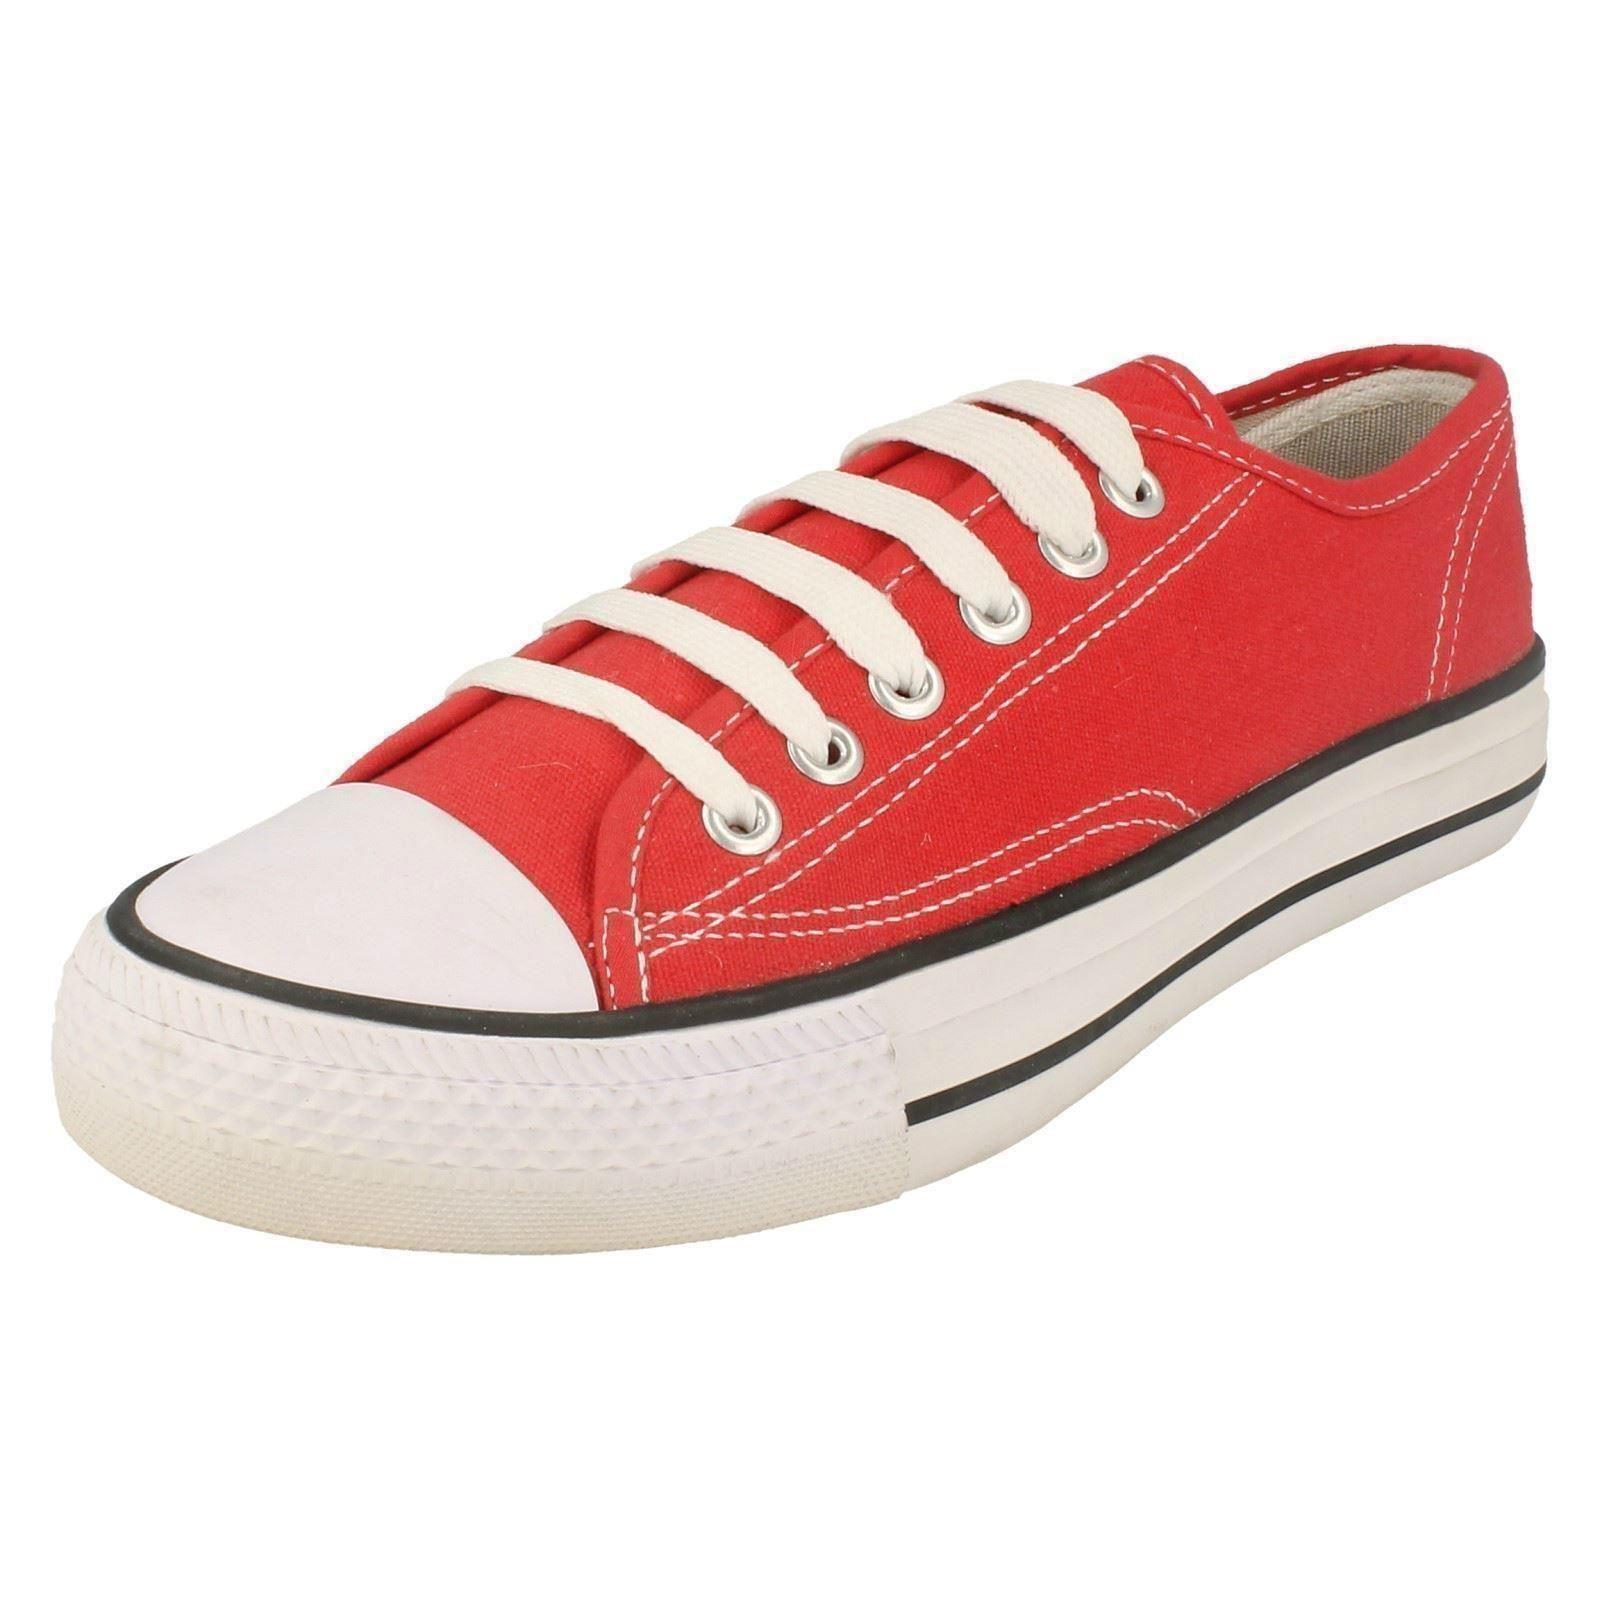 Mujer Spot On Lona Cordones  x0001 zapatos /Zapatillas x0001  28390a